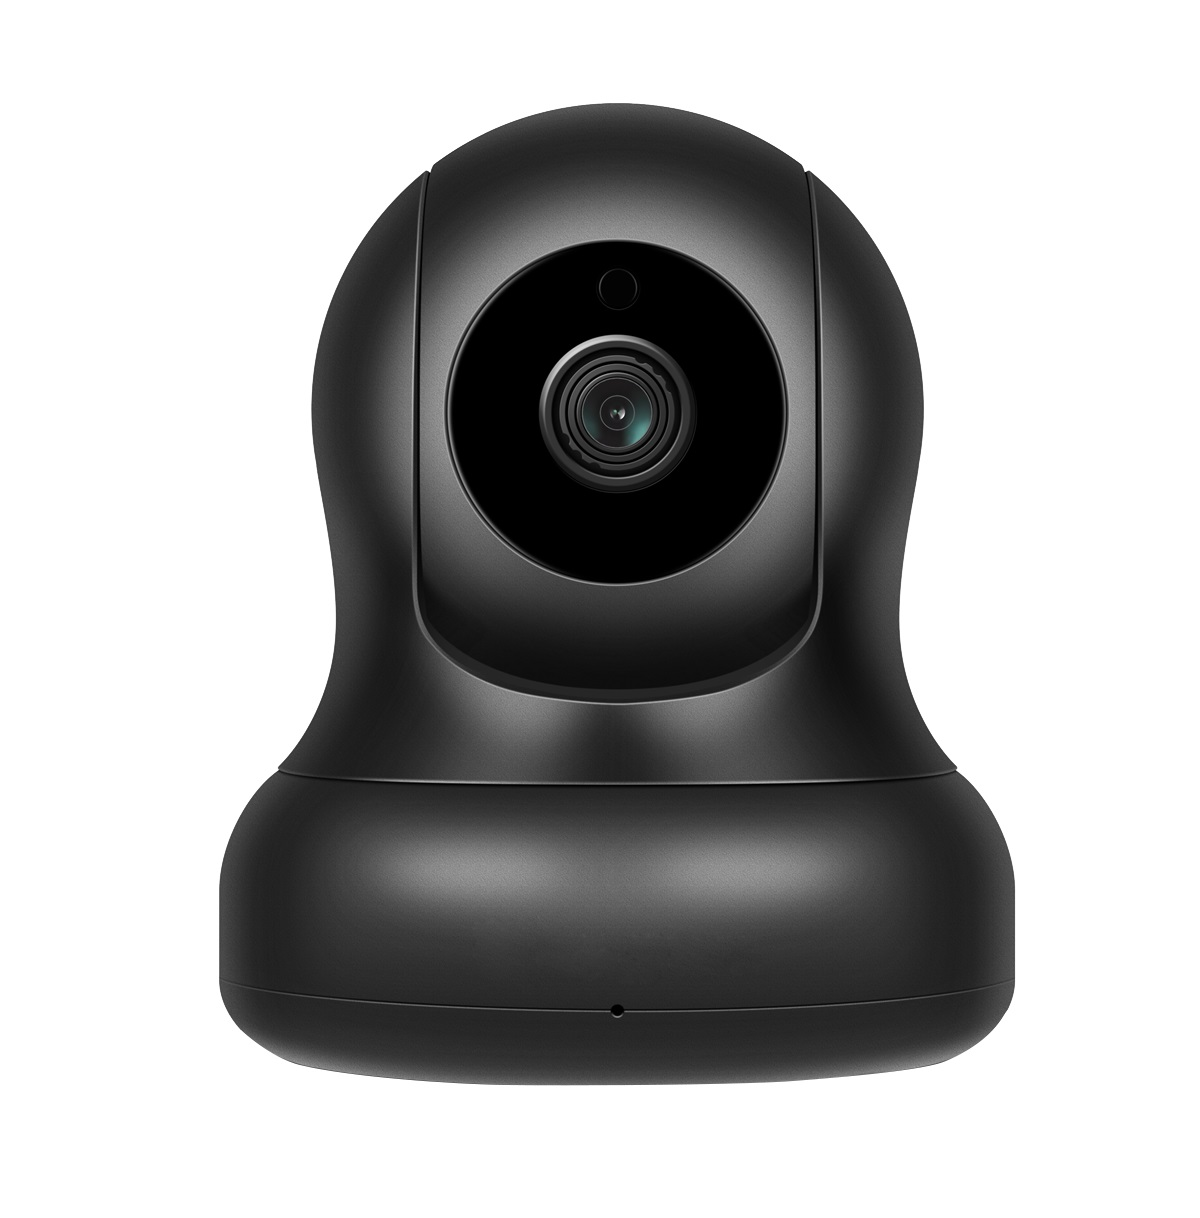 iGET SECURITY M3P15v2 - WiFi rotační IP FullHD 1080p kamera,noční LED,microSD slot,pro alarm iGET M4 - SECURITY M3P15v2